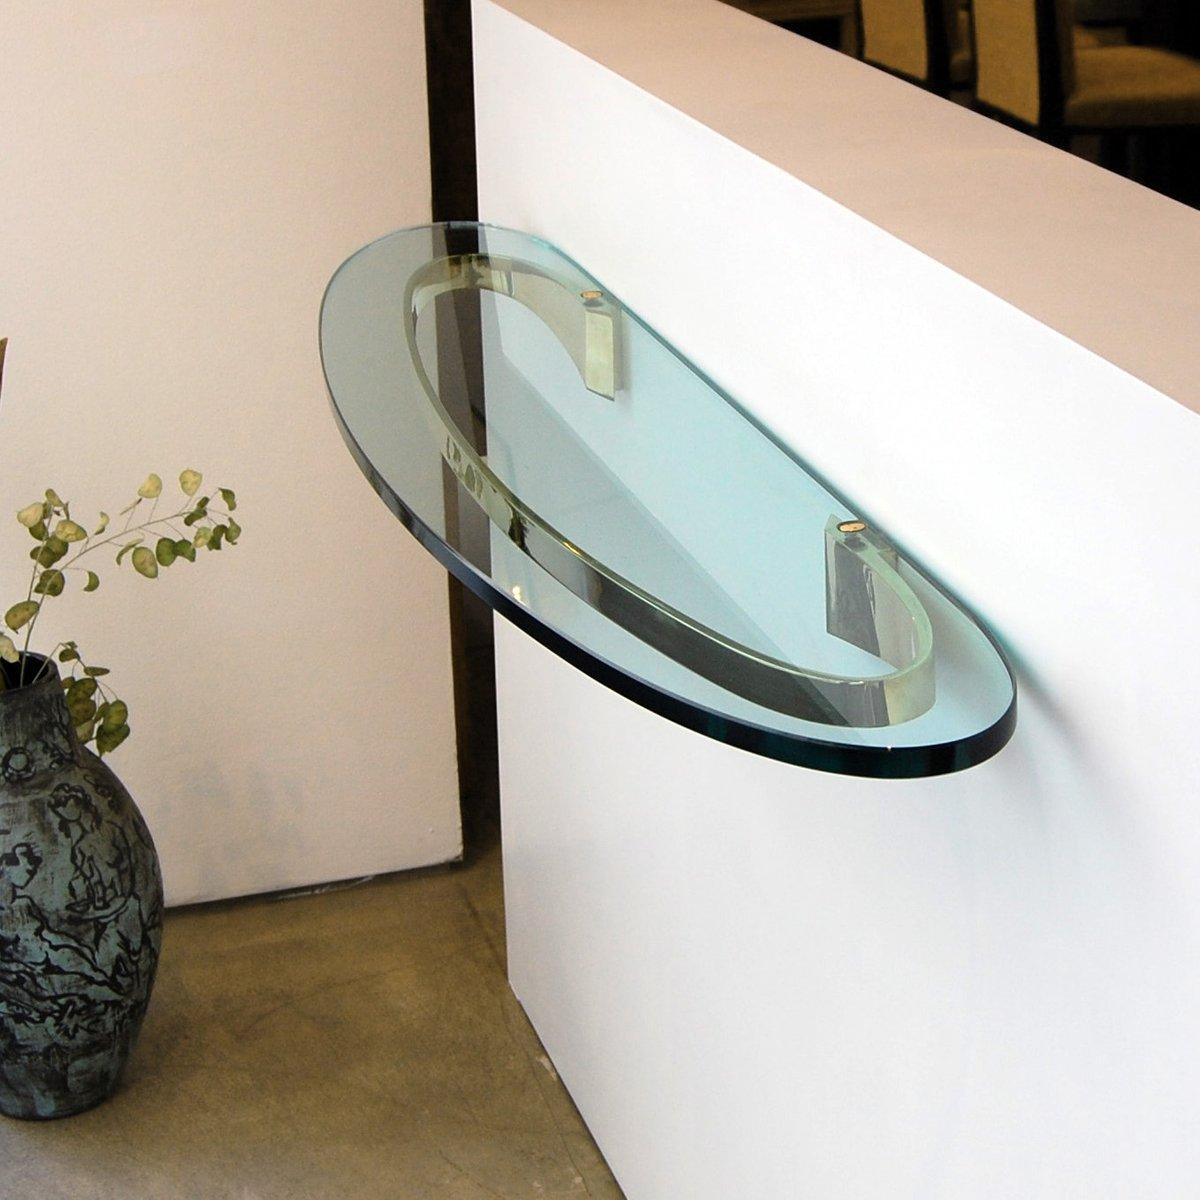 mid century modell 2186 glas konsole von fontana arte bei pamono kaufen. Black Bedroom Furniture Sets. Home Design Ideas